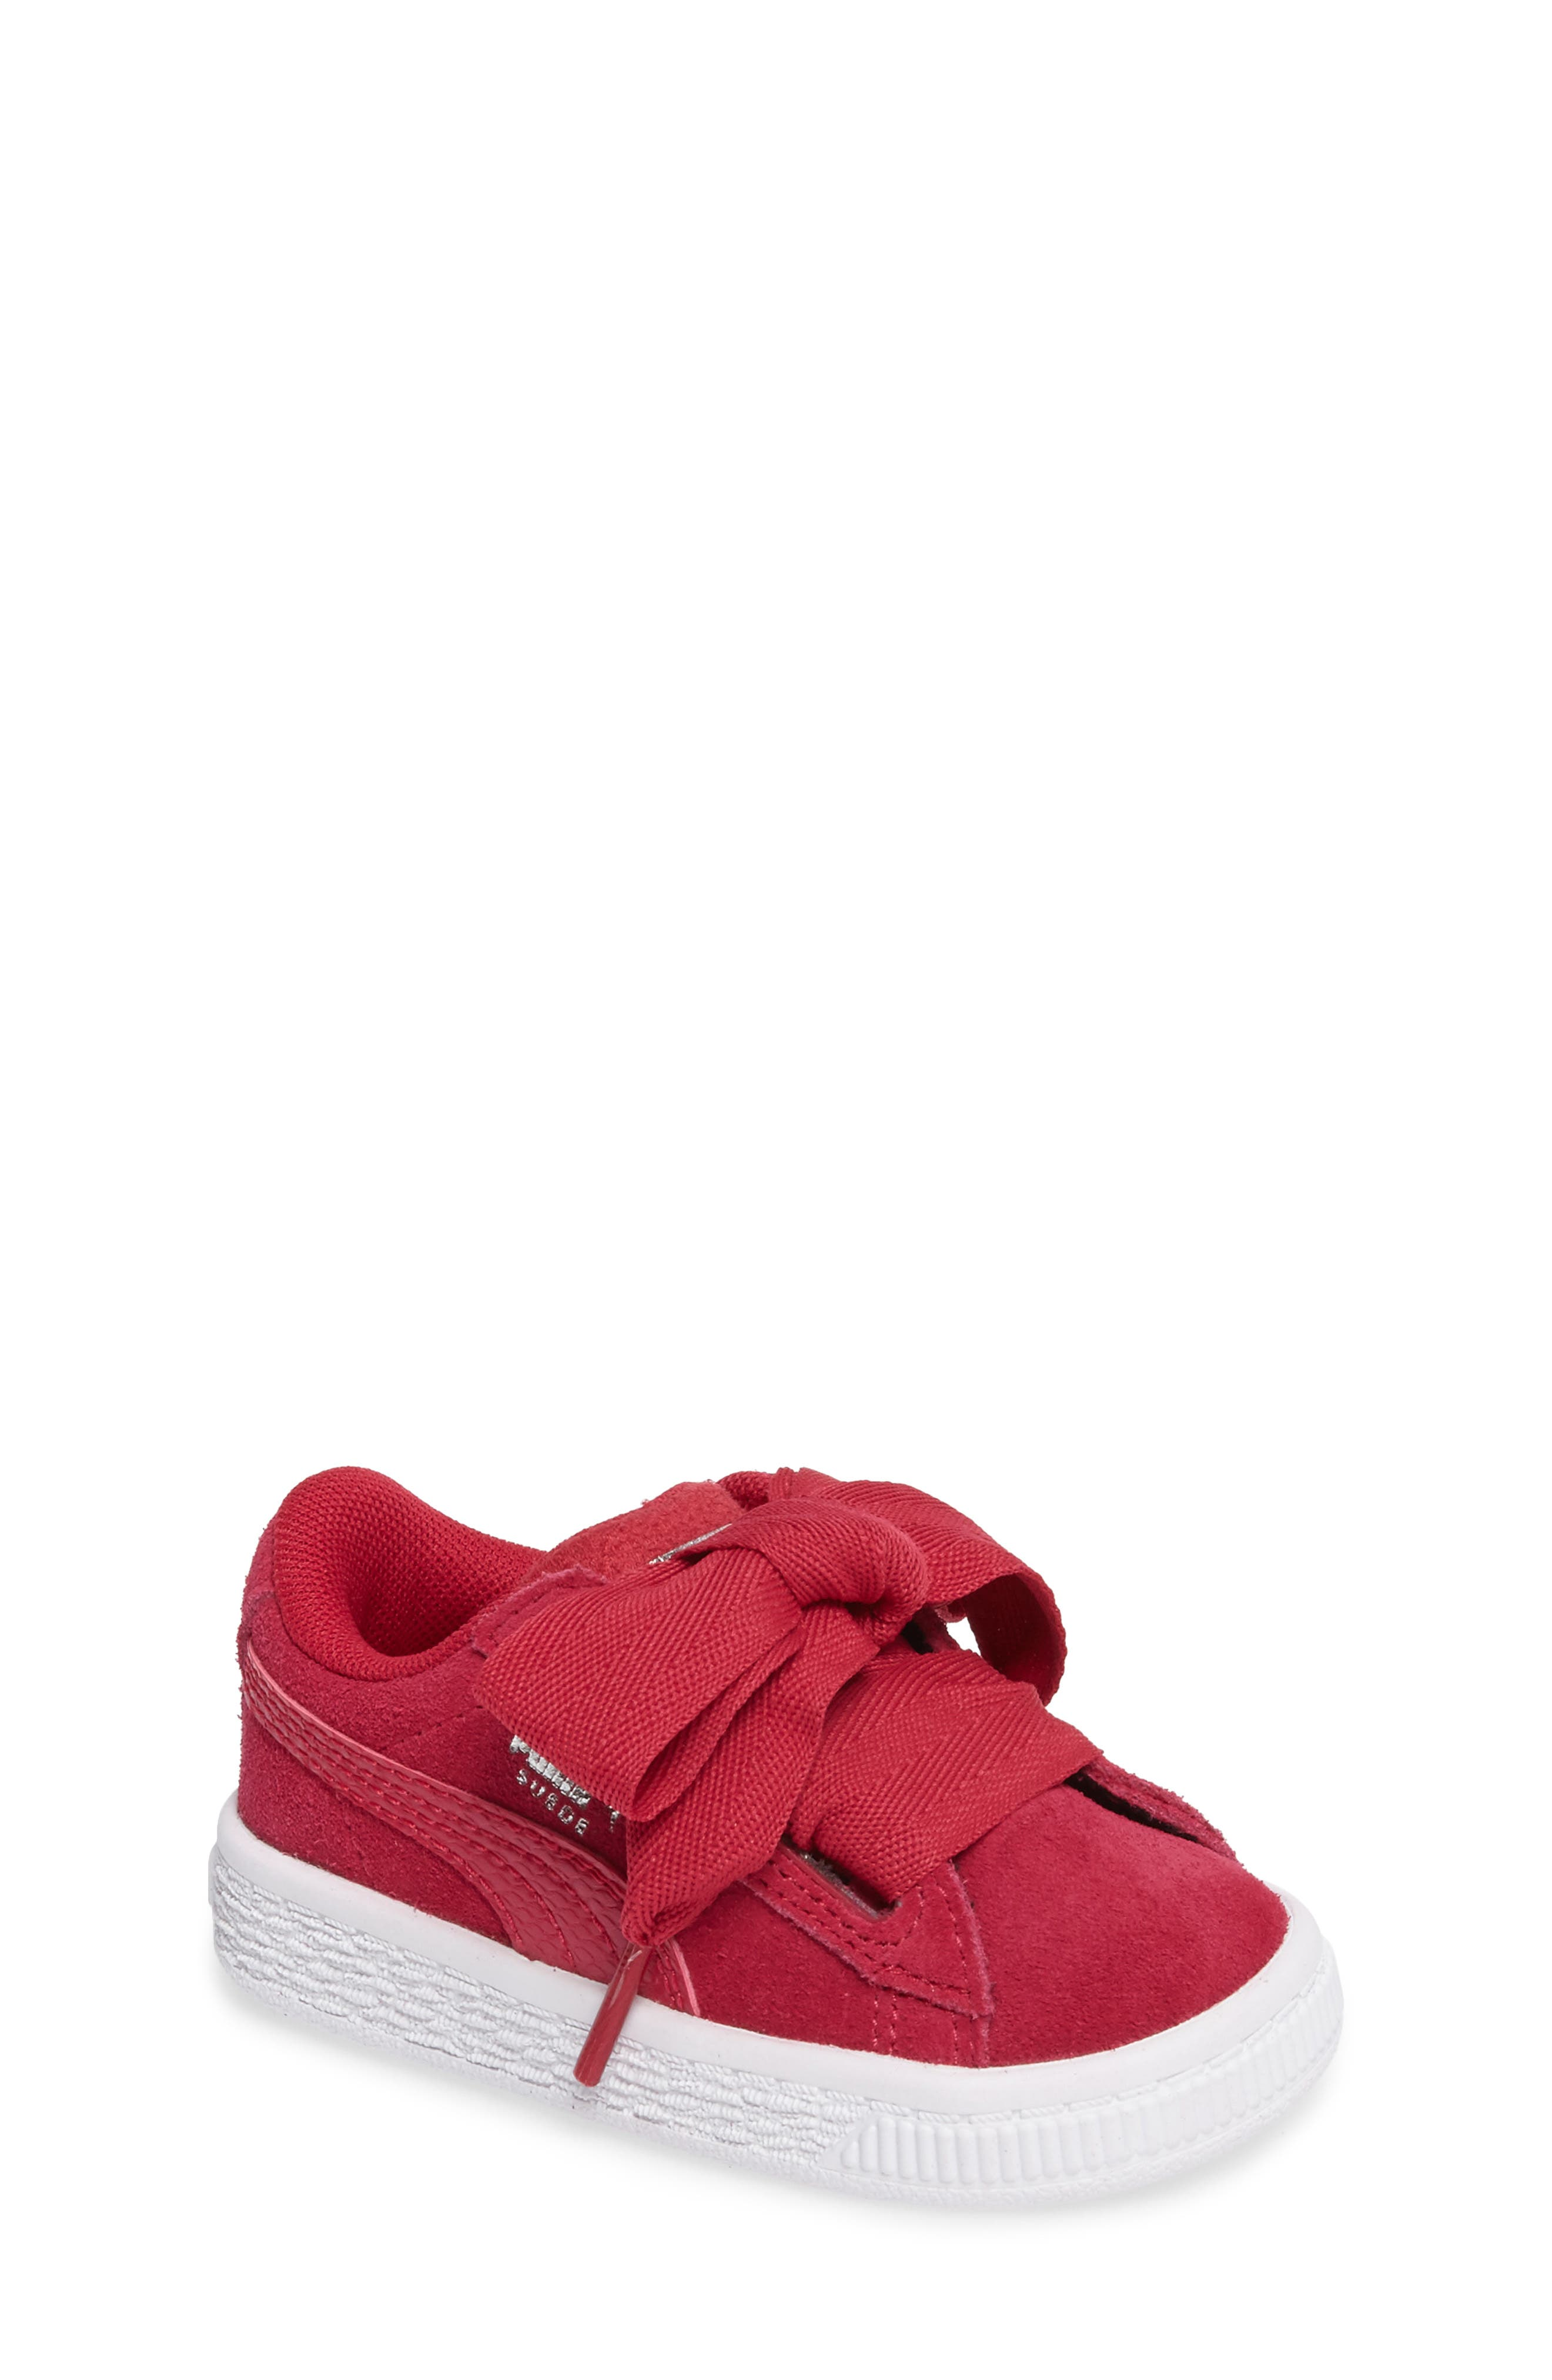 PUMA Heart Sneaker (Baby, Walker & Toddler)